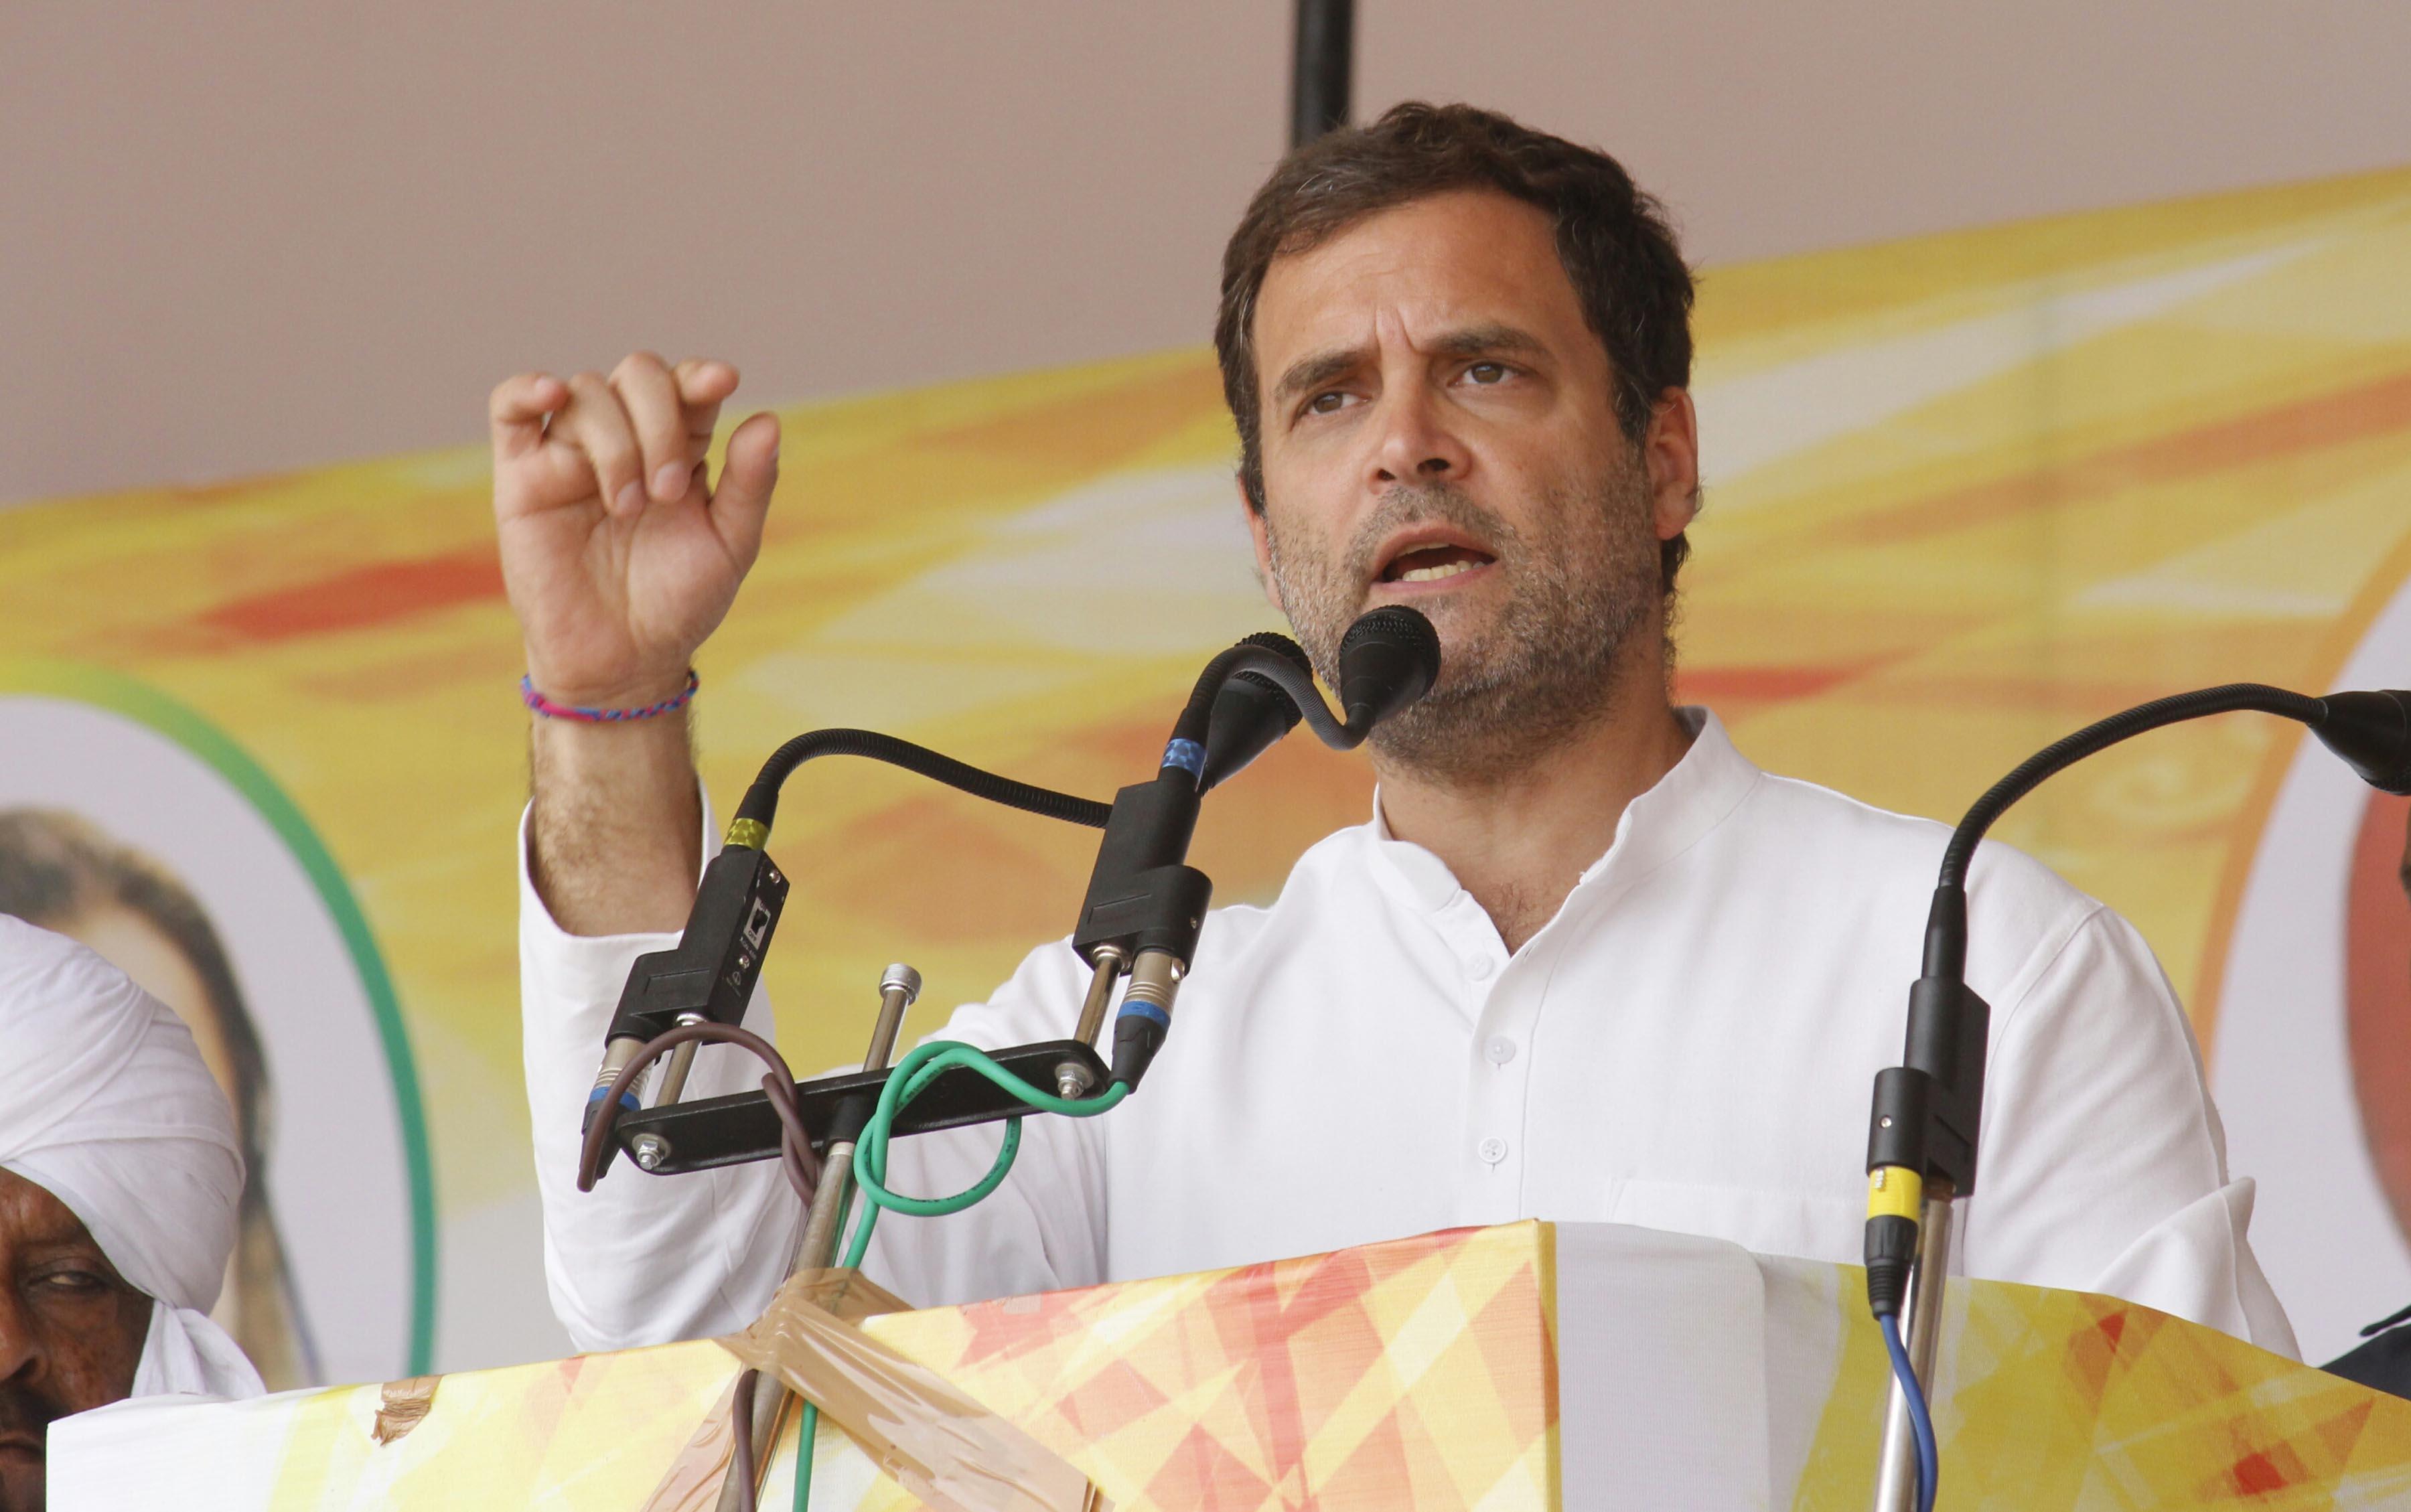 Congress President Rahul Gandhi addressing an election rally at Bargari Stadium, in Faridkot, Punjab on Wednesday. (UNI)